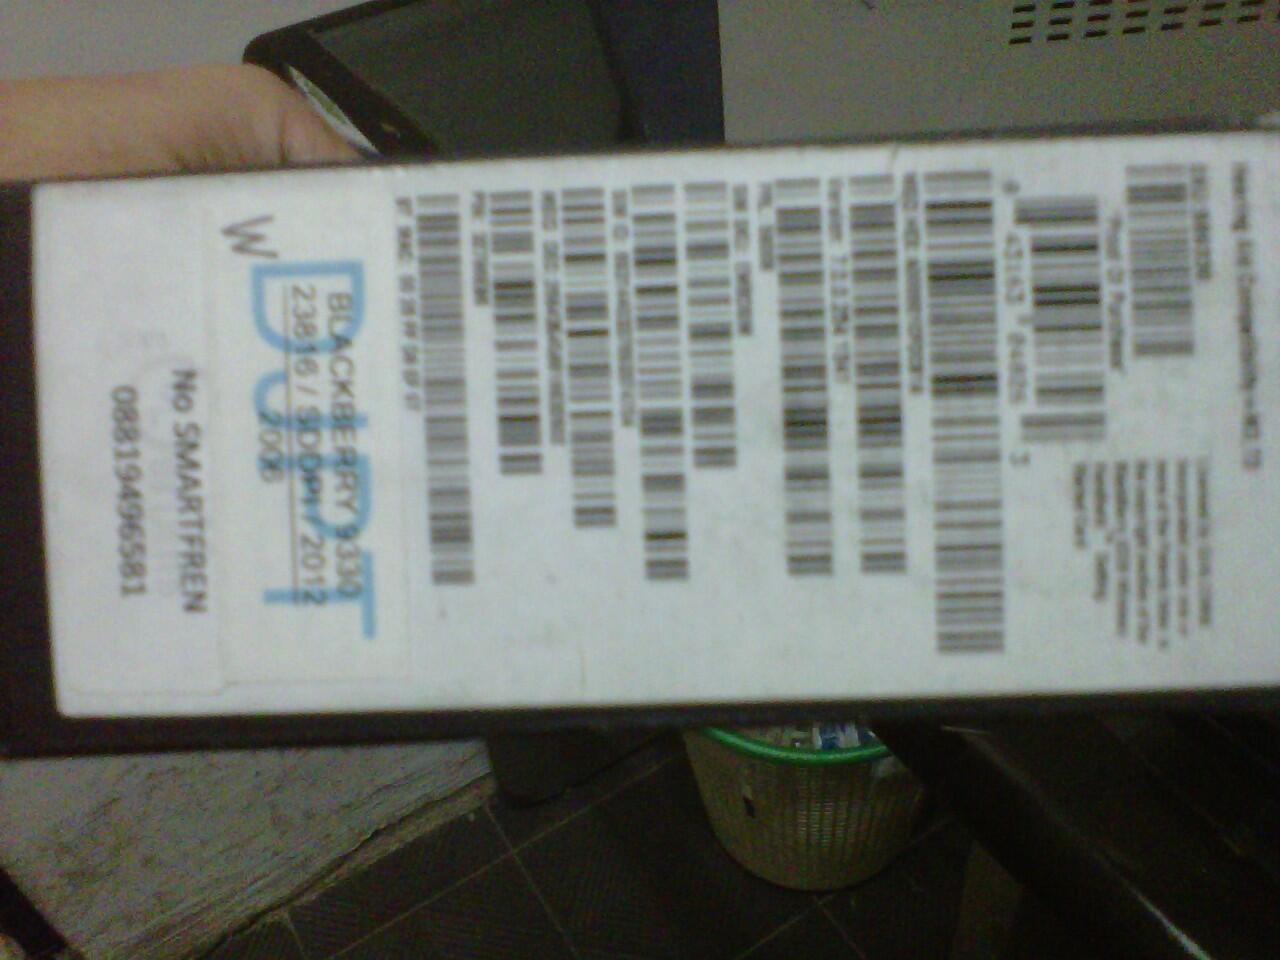 JUAL blackberry kepler jupiter 9330 garansi bless 2thn surabaya